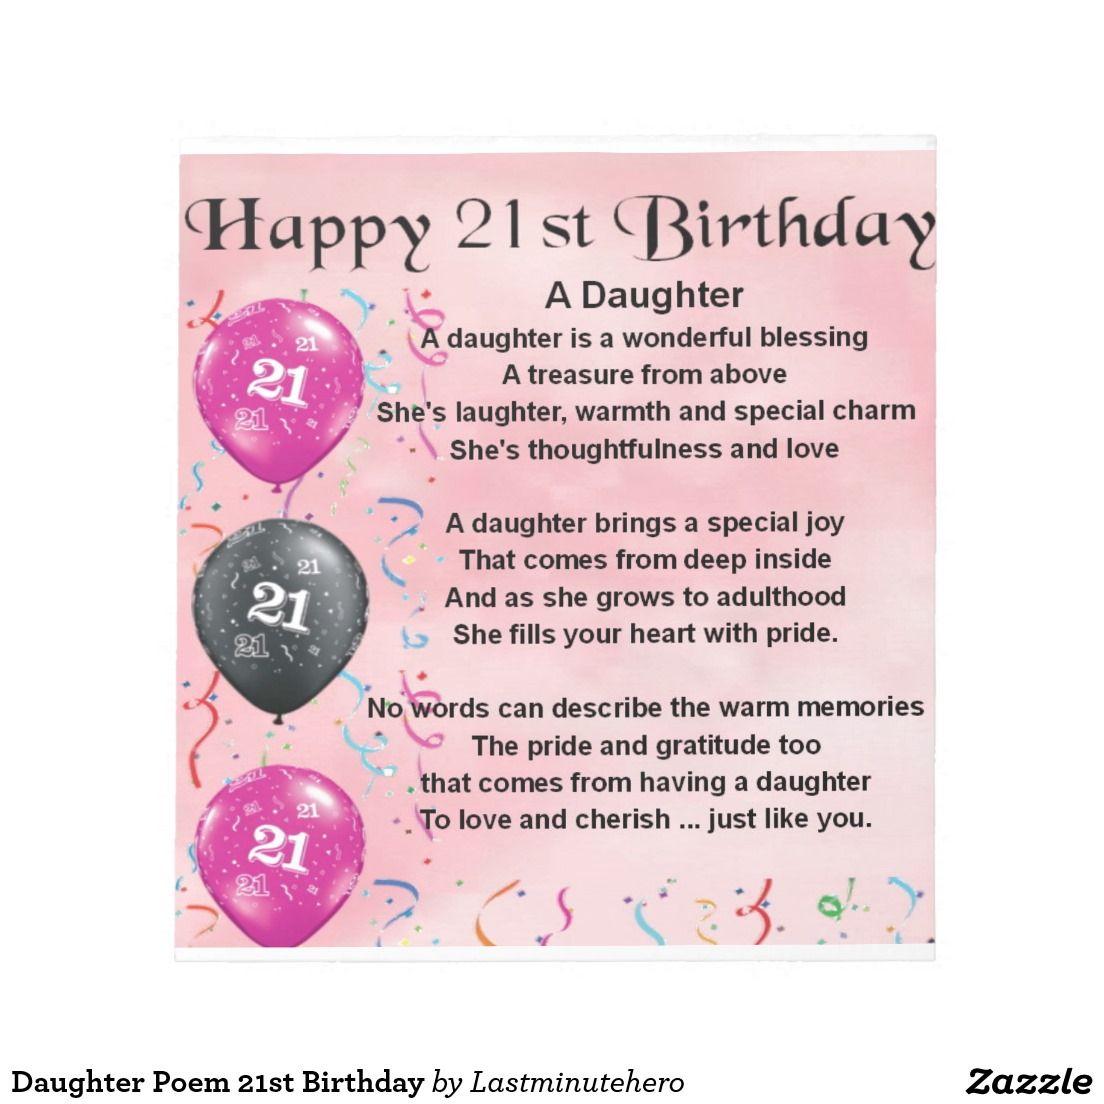 Daughter poem 21st birthday notepad 21st birthday poem and birthdays kristyandbryce Image collections